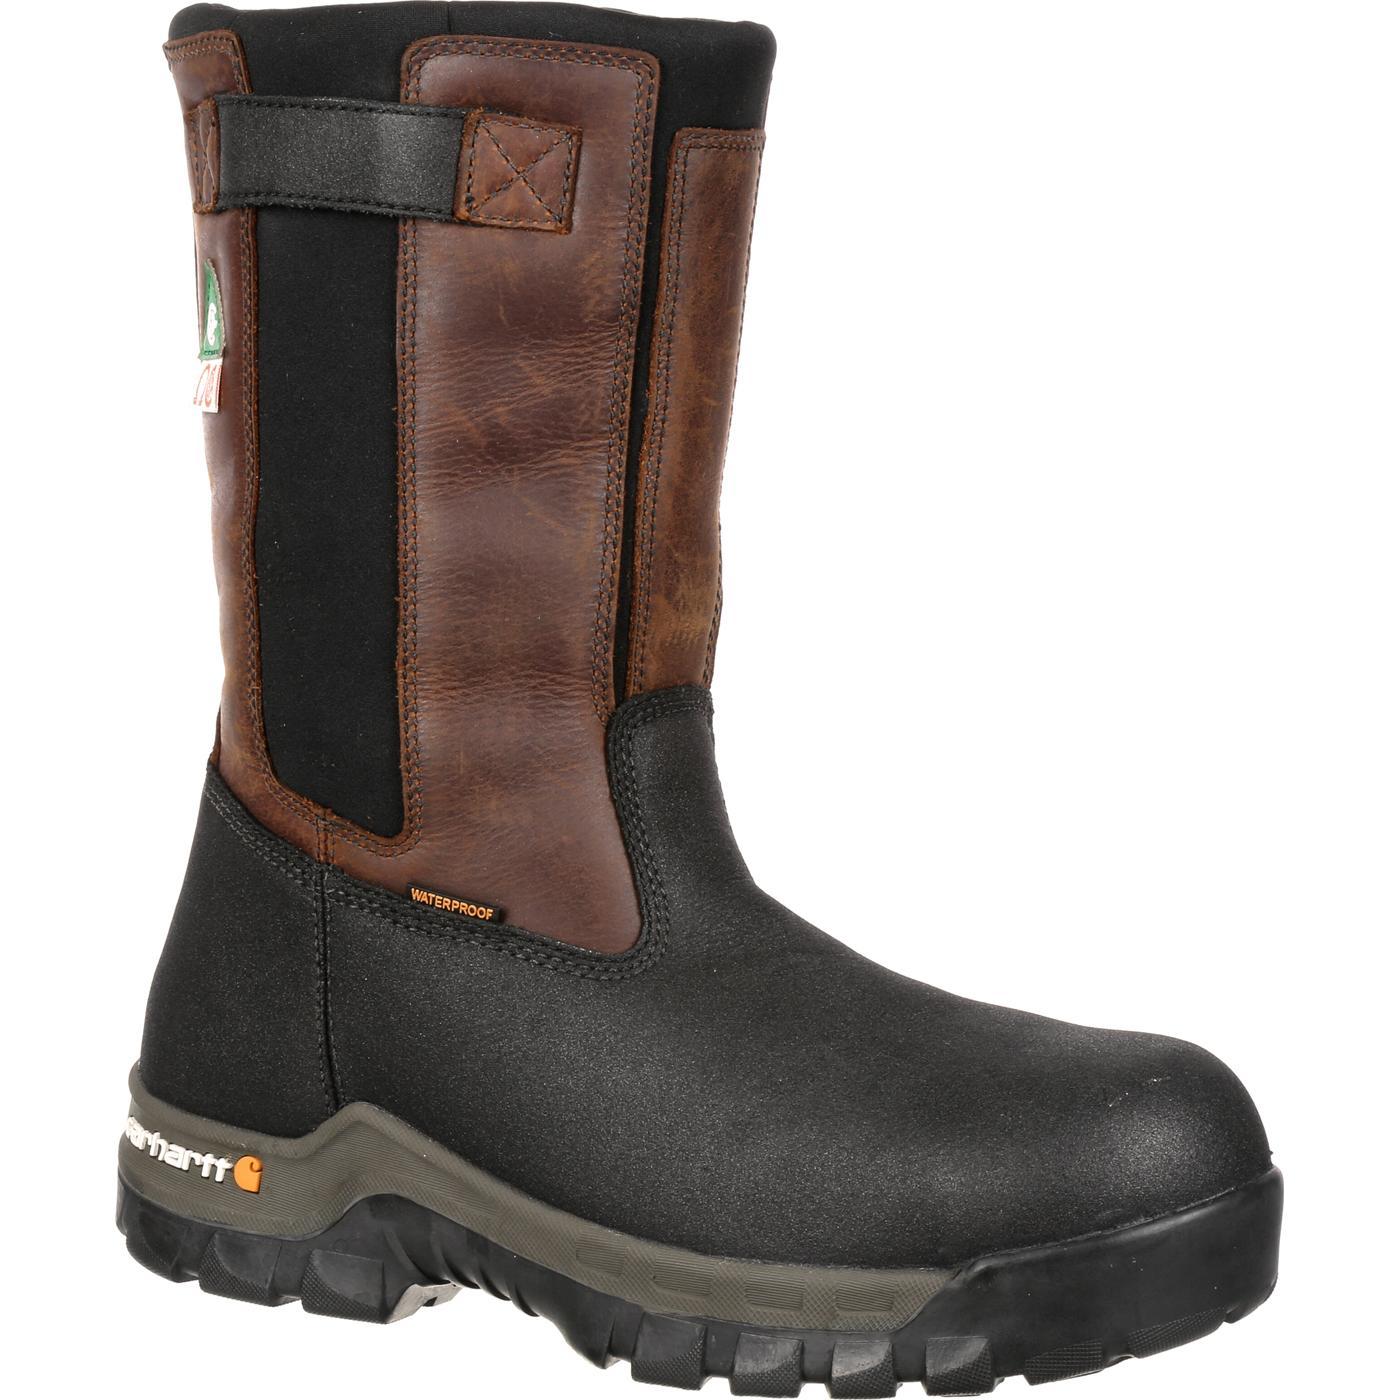 e726b8ca950 Carhartt Rugged Flex Composite Toe Waterproof Wellington, , large